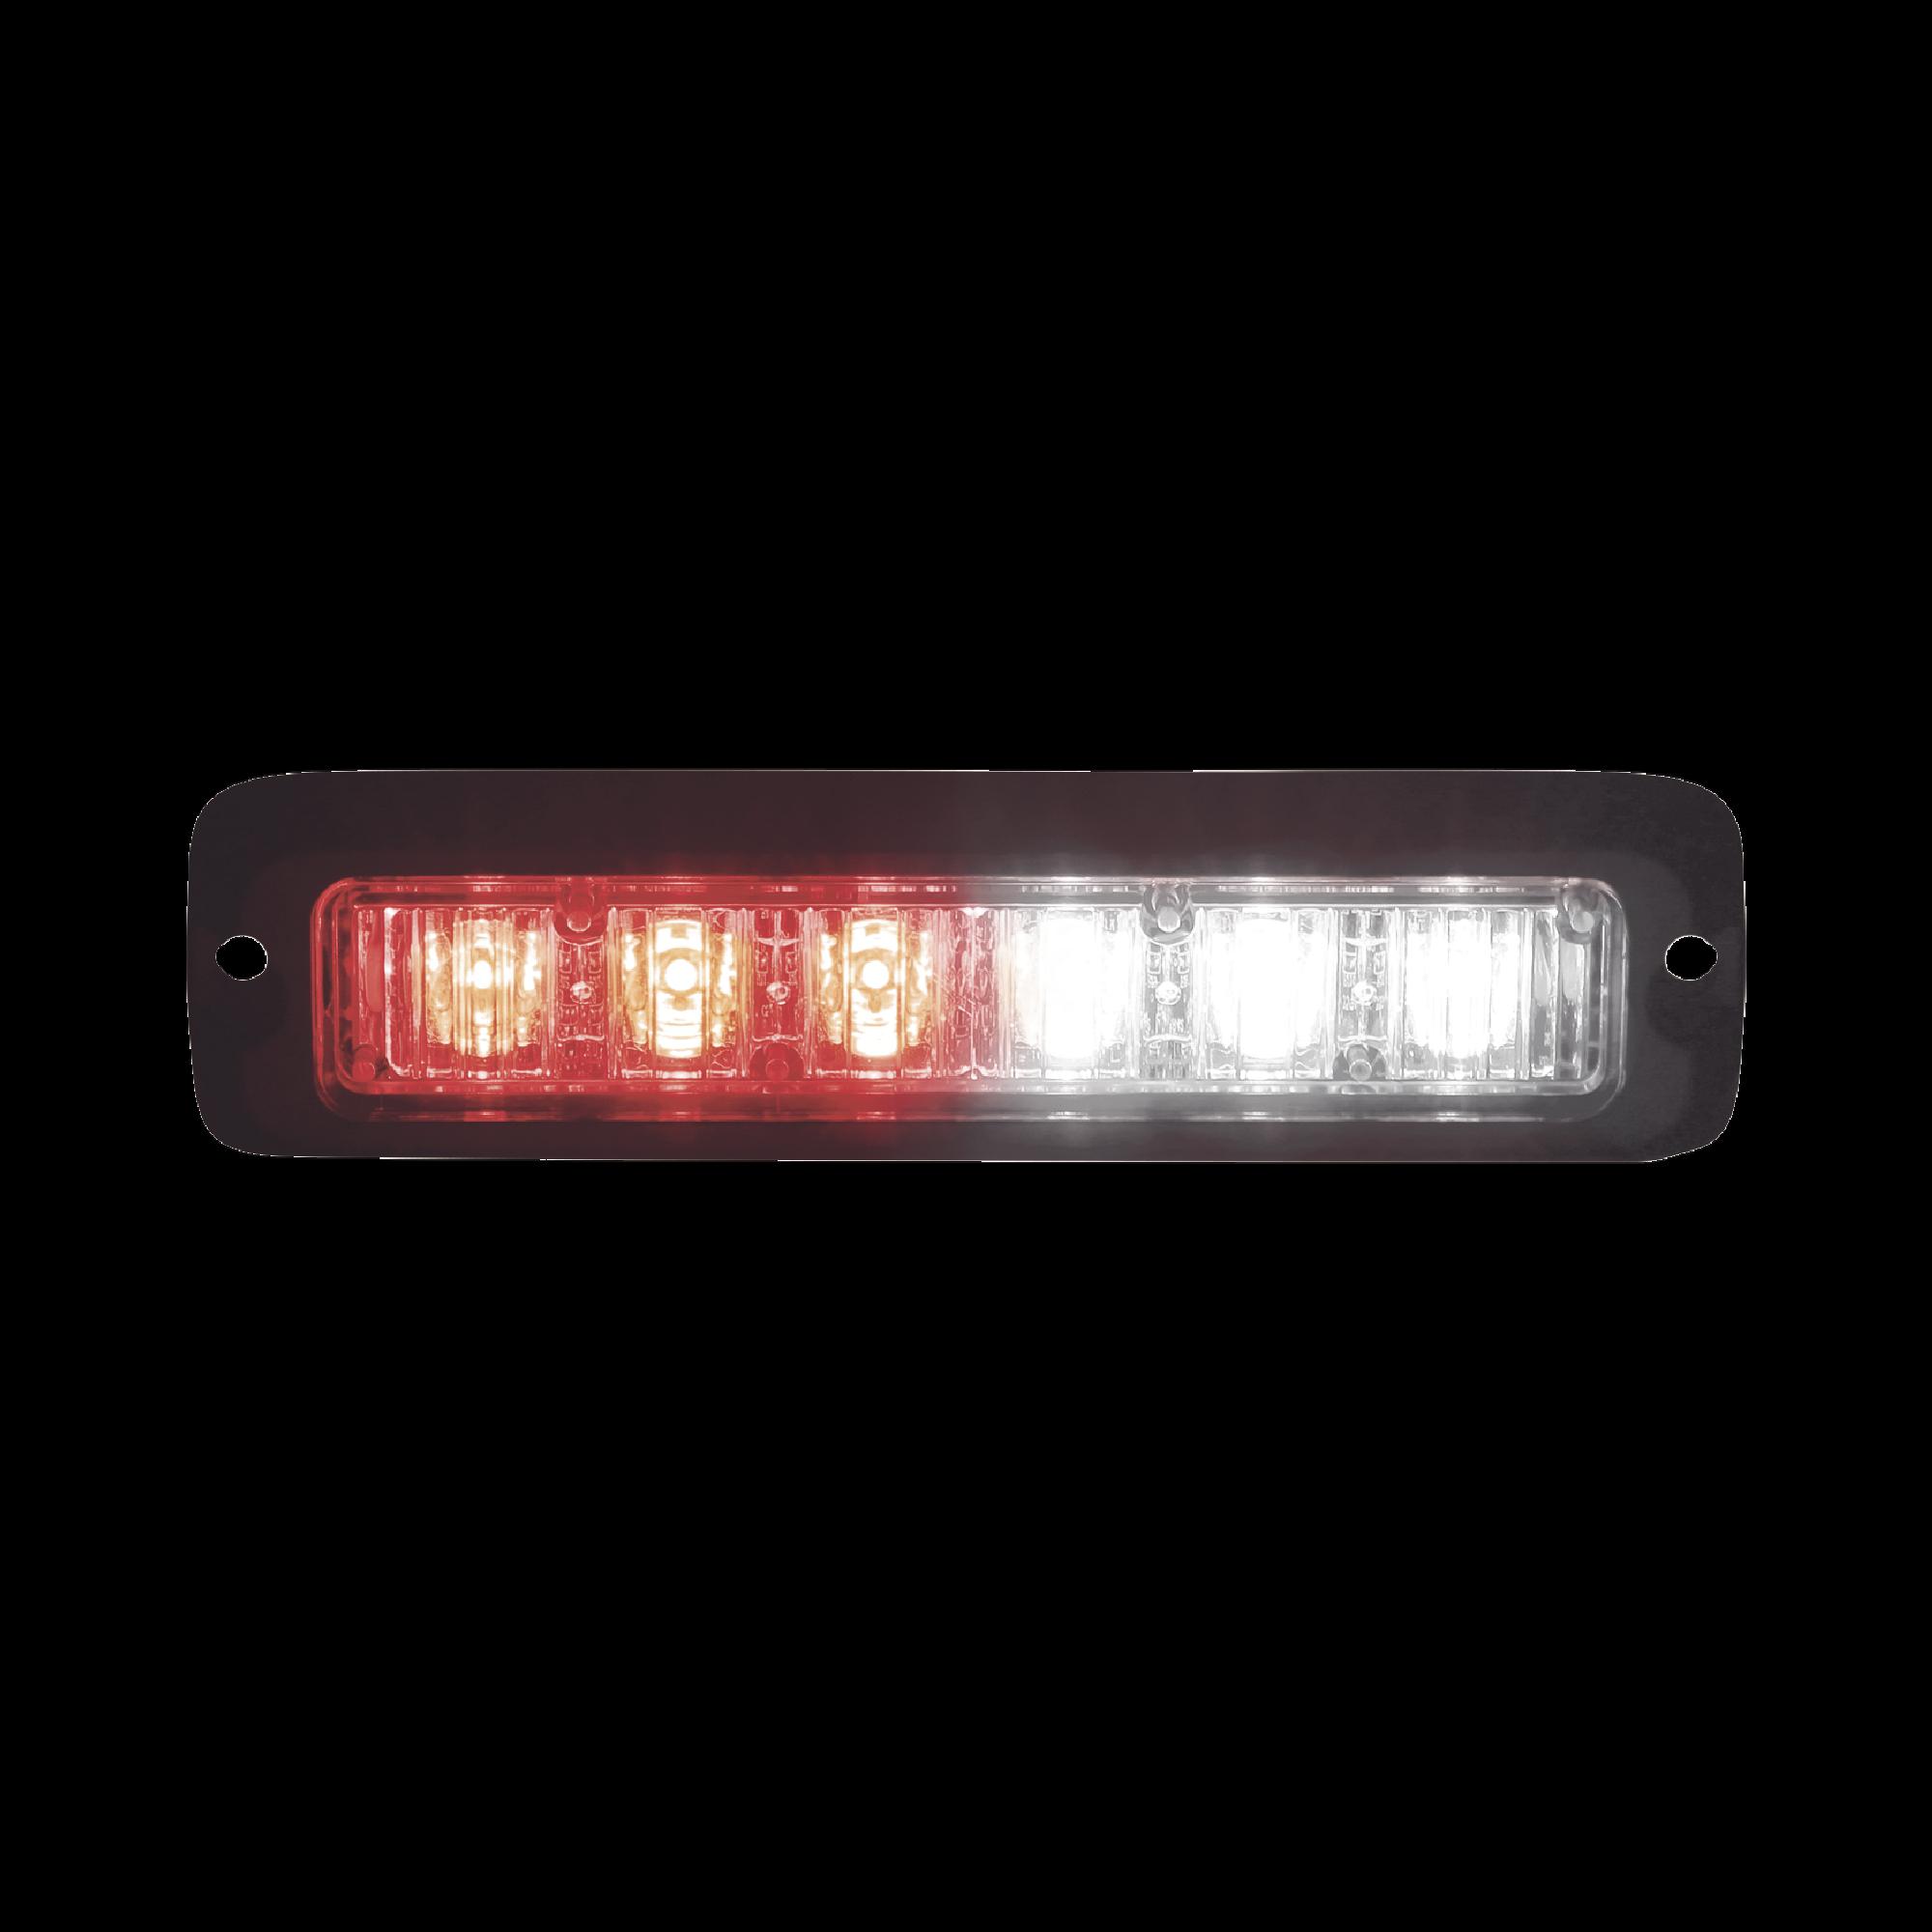 Luz led perimetral MR6 rojo / claro con soporte para empotrar